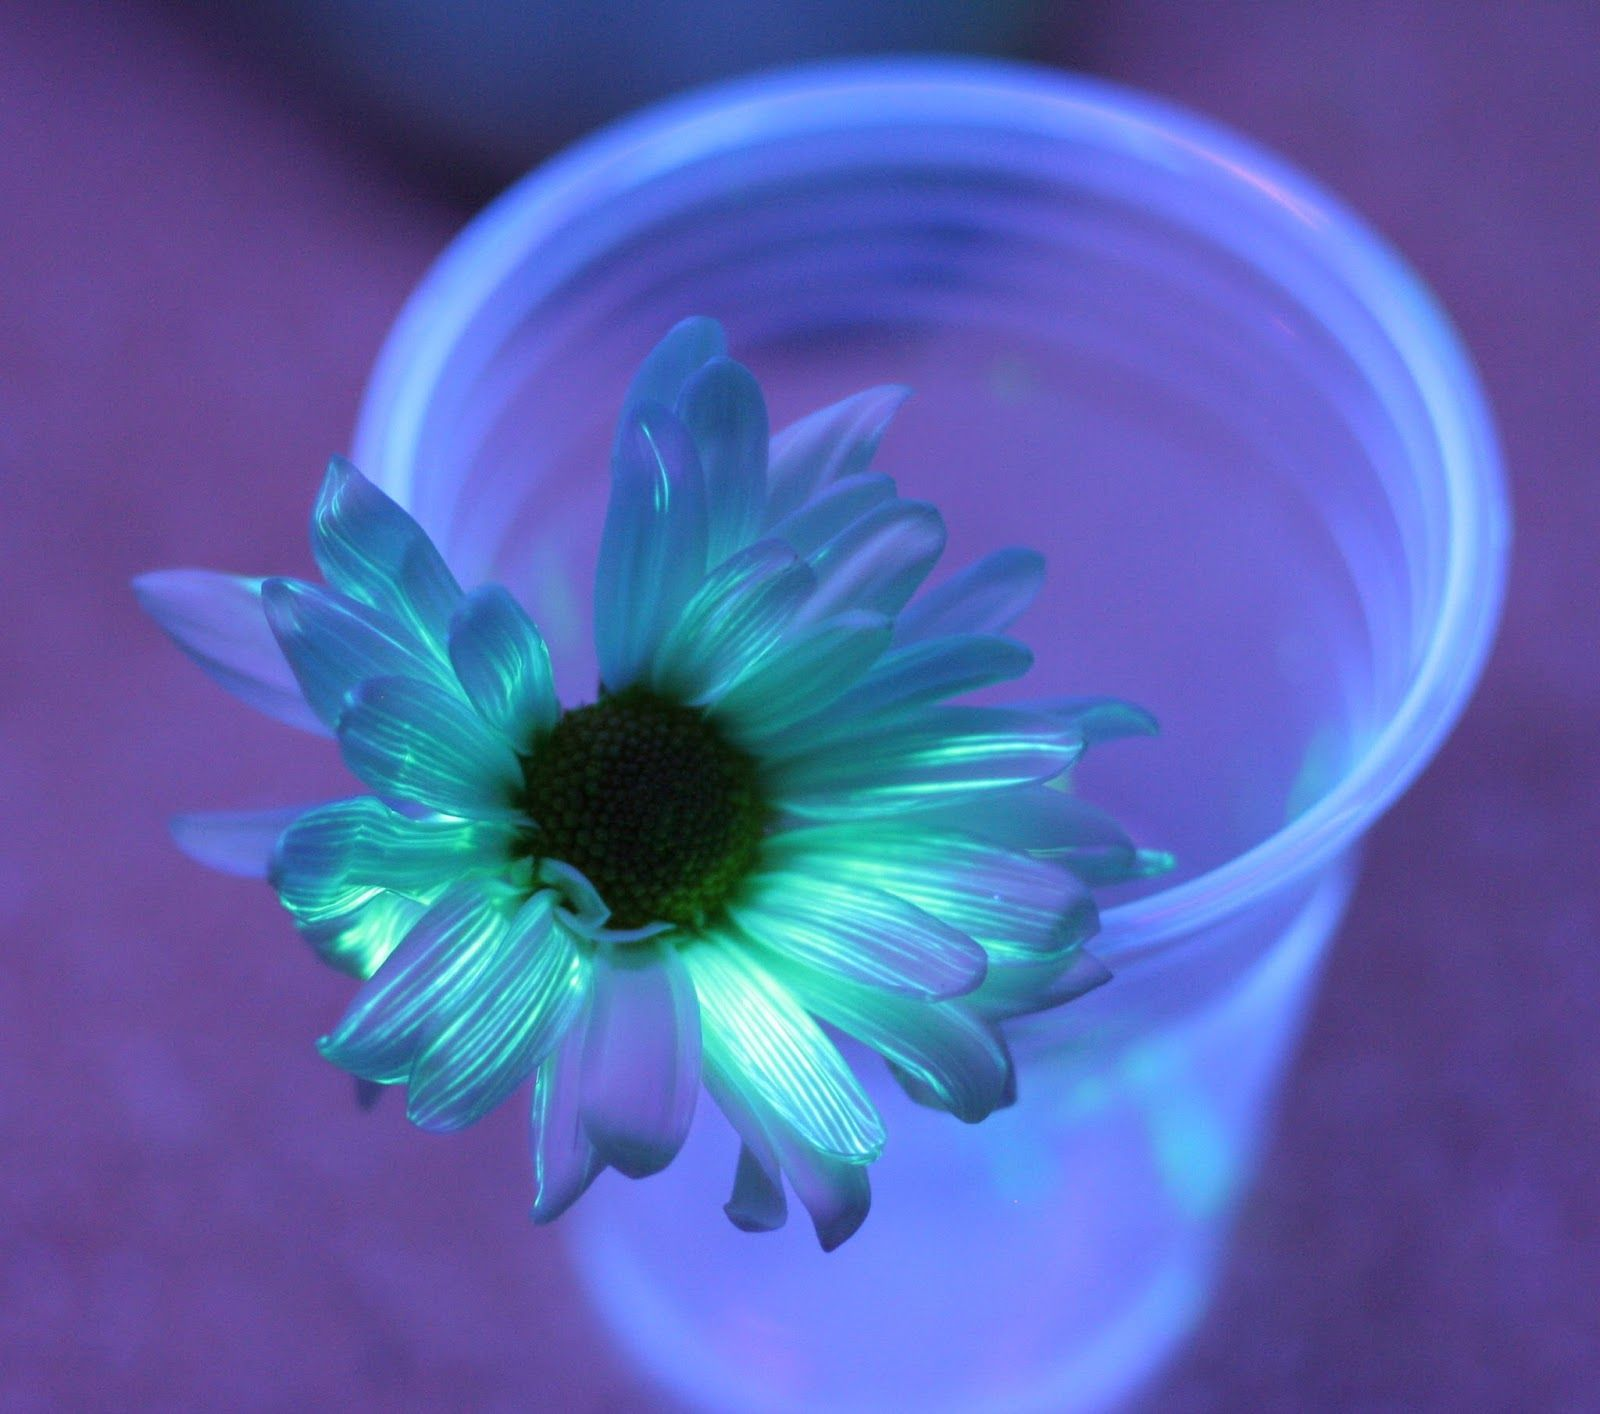 Flower Science Experiment for Kids: DIY Glowing Flowers | Glowing ...